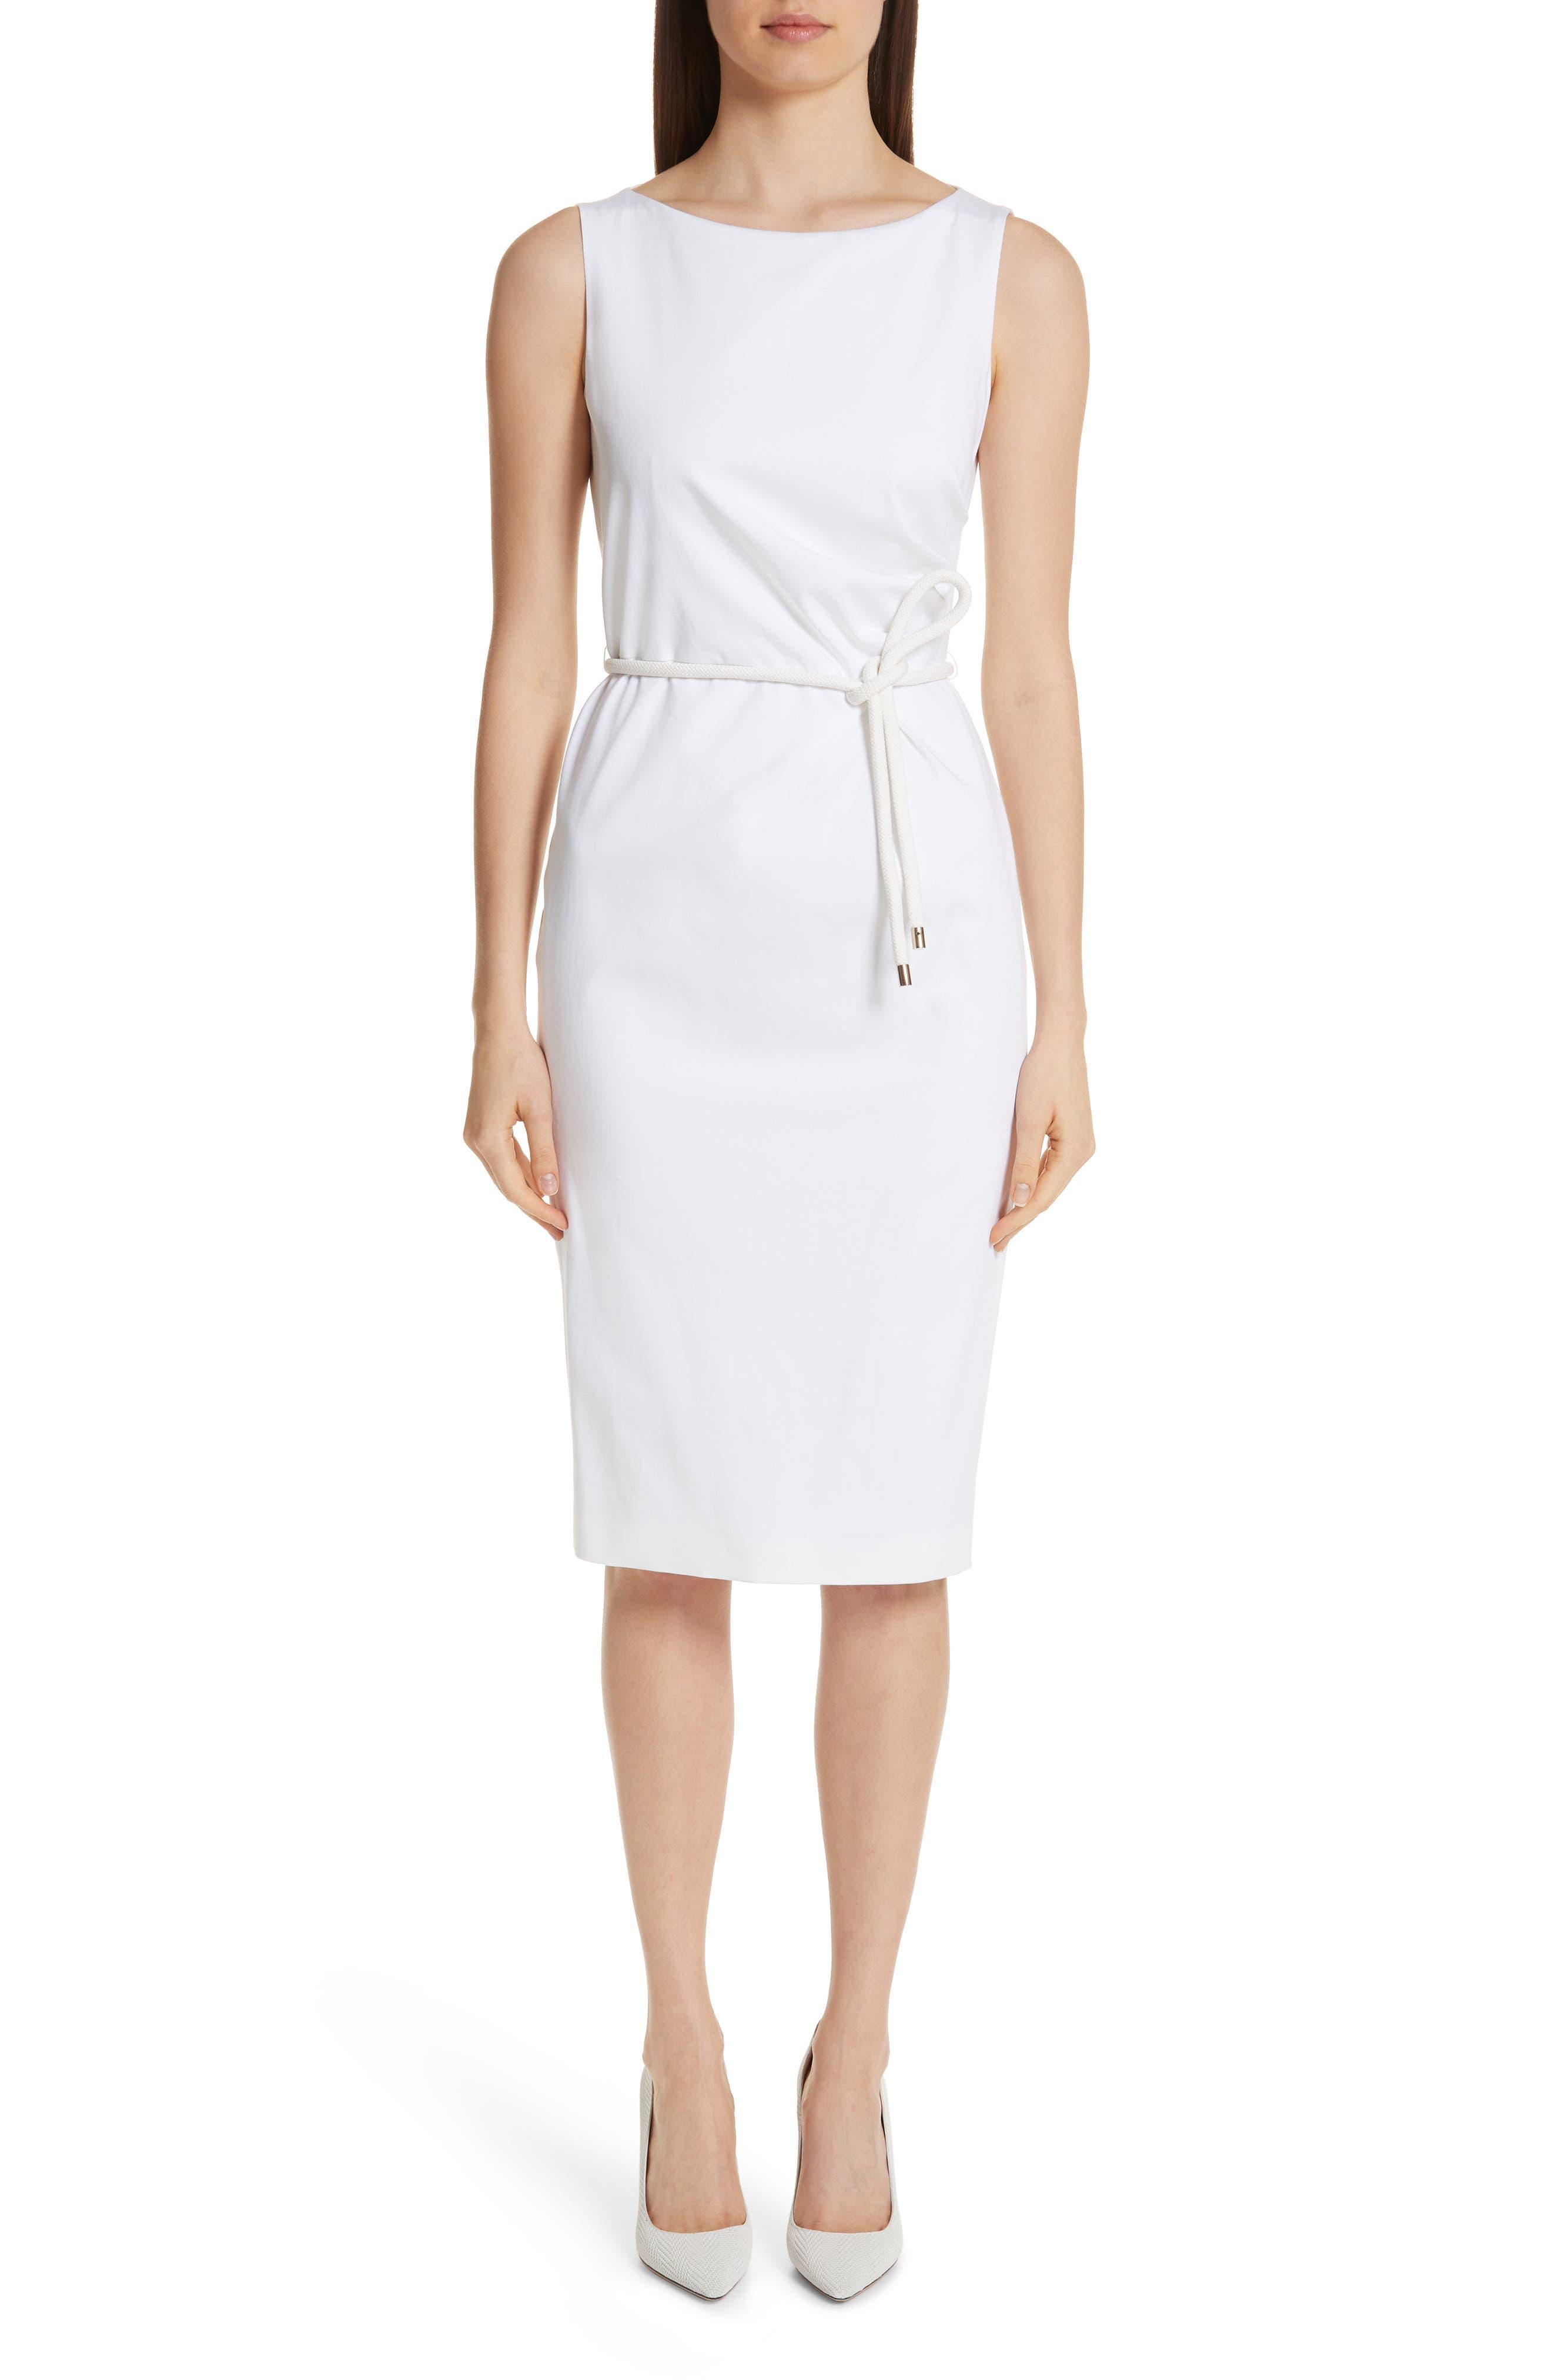 MAX MARA Cordoba Sheath Dress, Main, color, OPTICAL WHITE